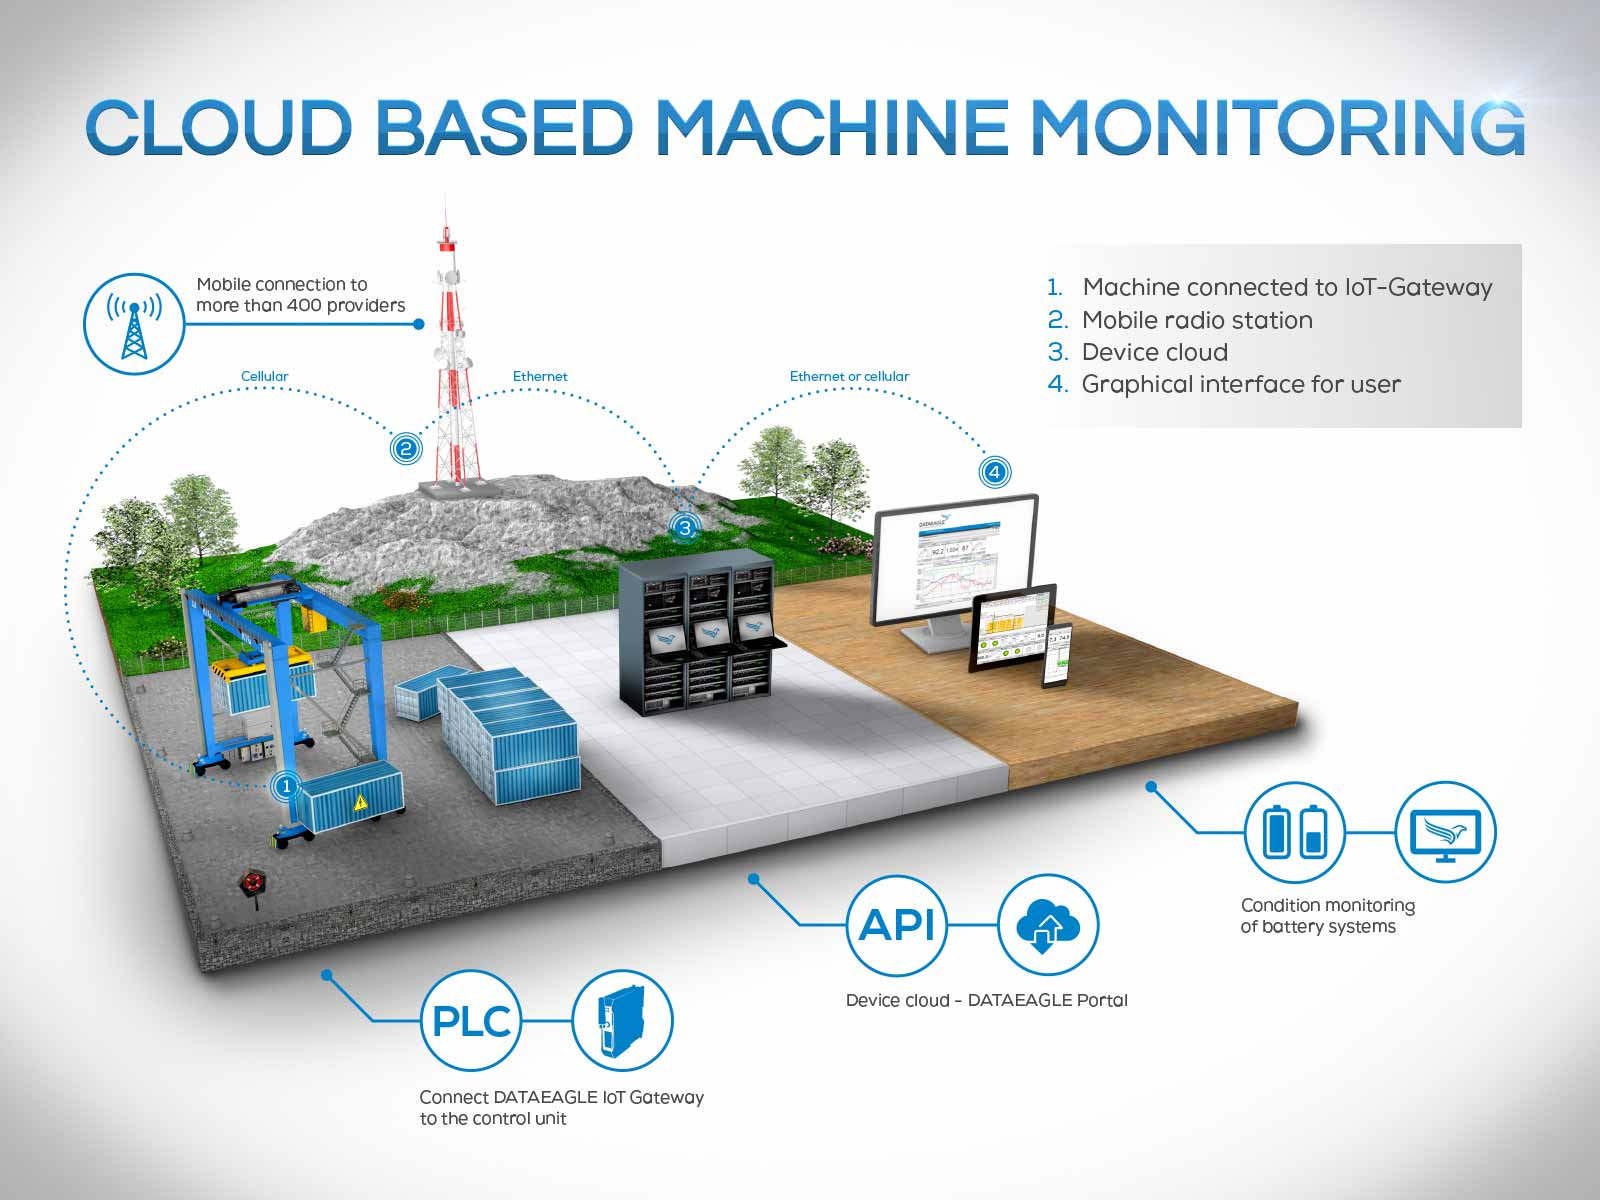 Cloud Based Machine Monitoring of E-RTG Cranes